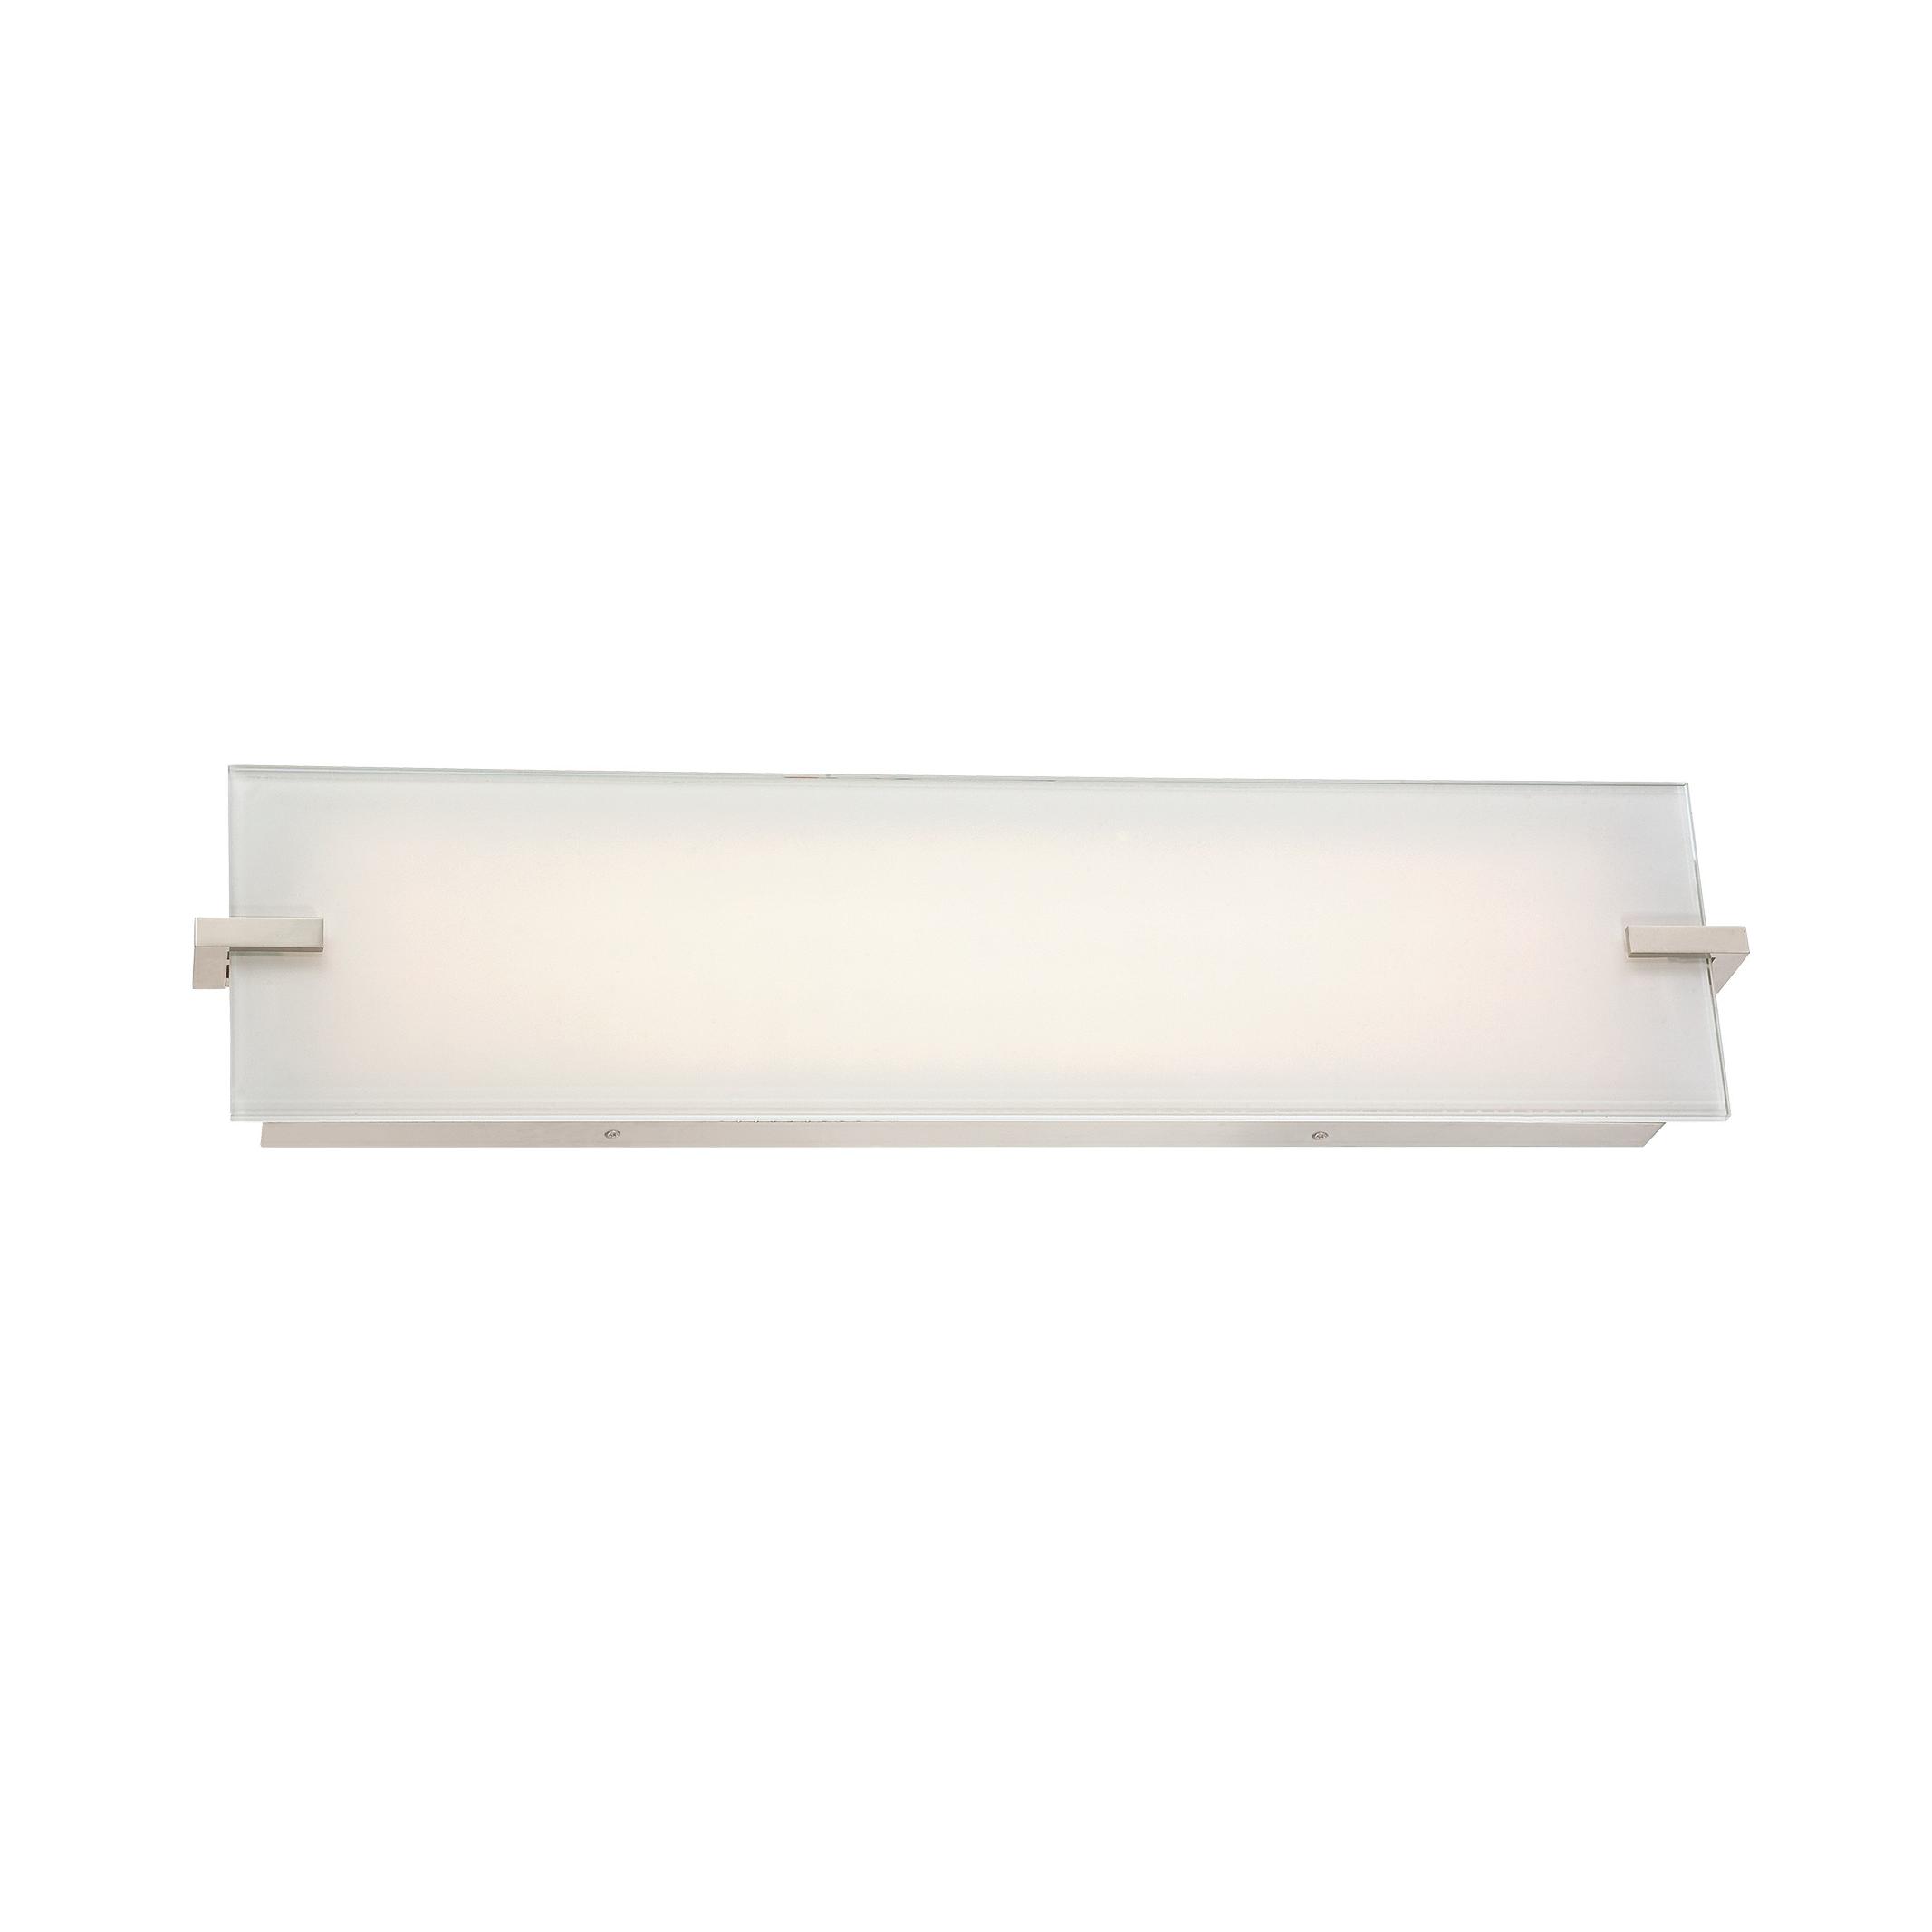 Kovacs LED Lights